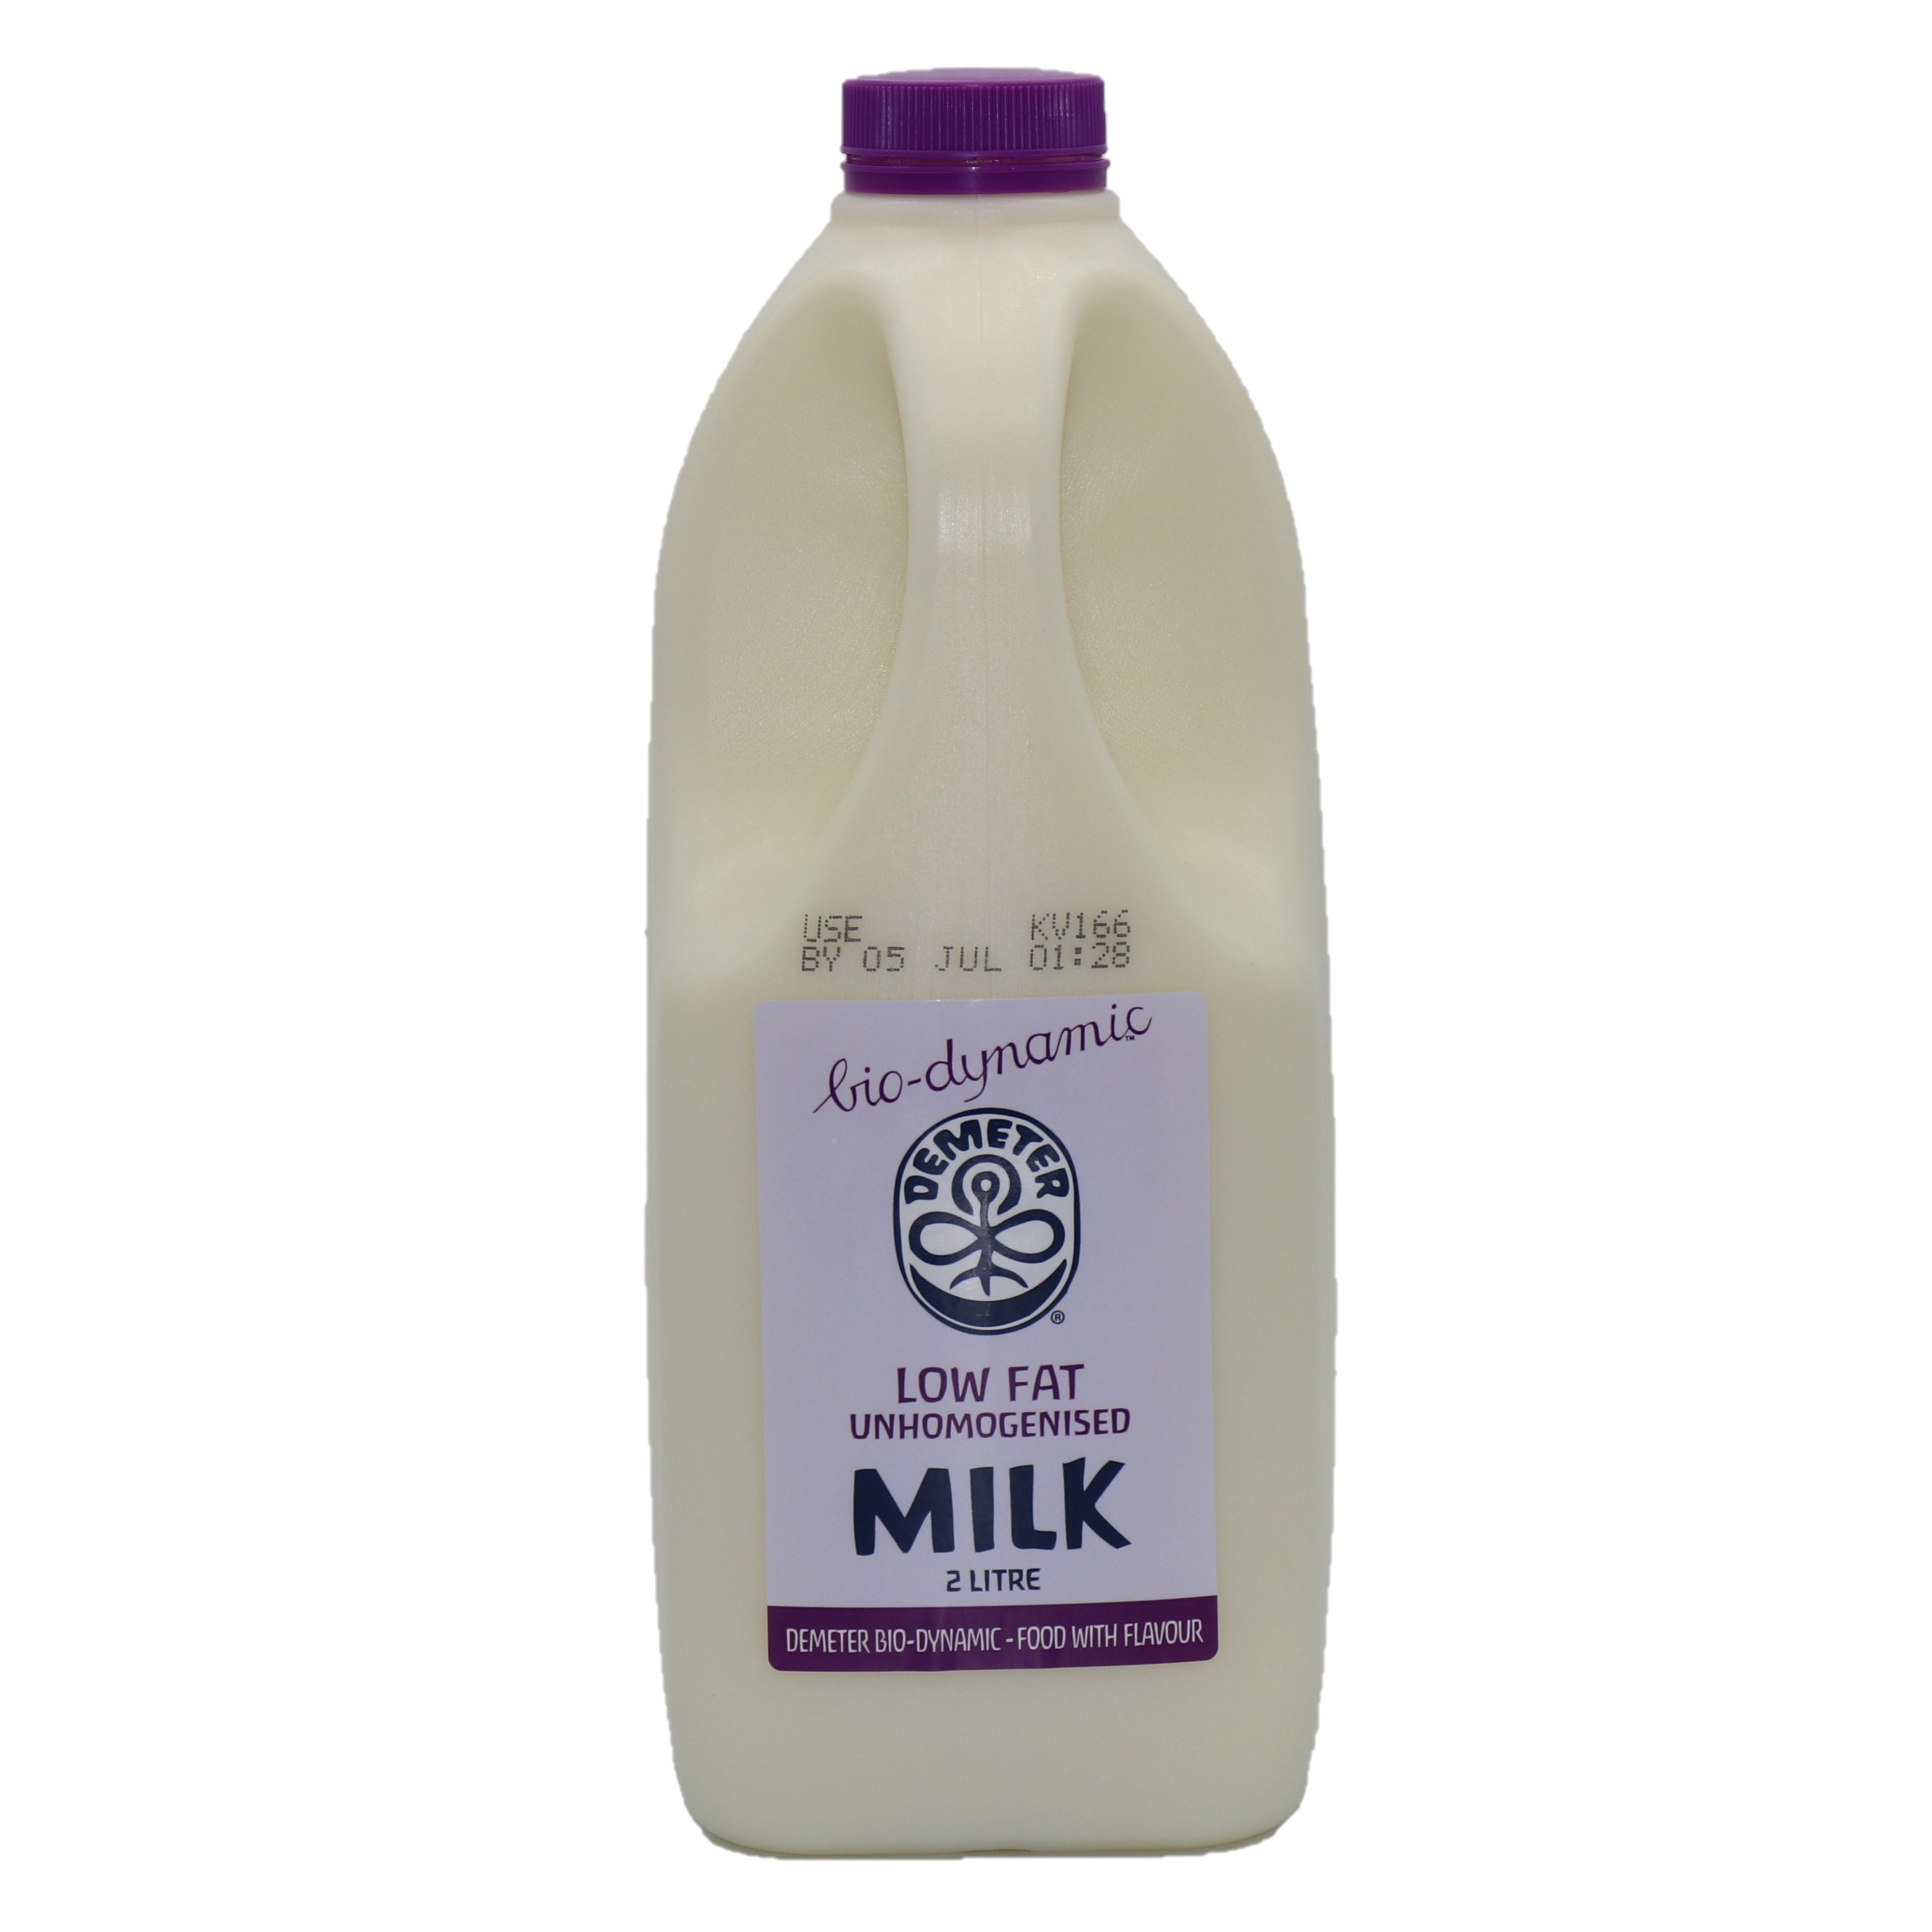 Milk – Low Fat Unhomogenised 6x2l